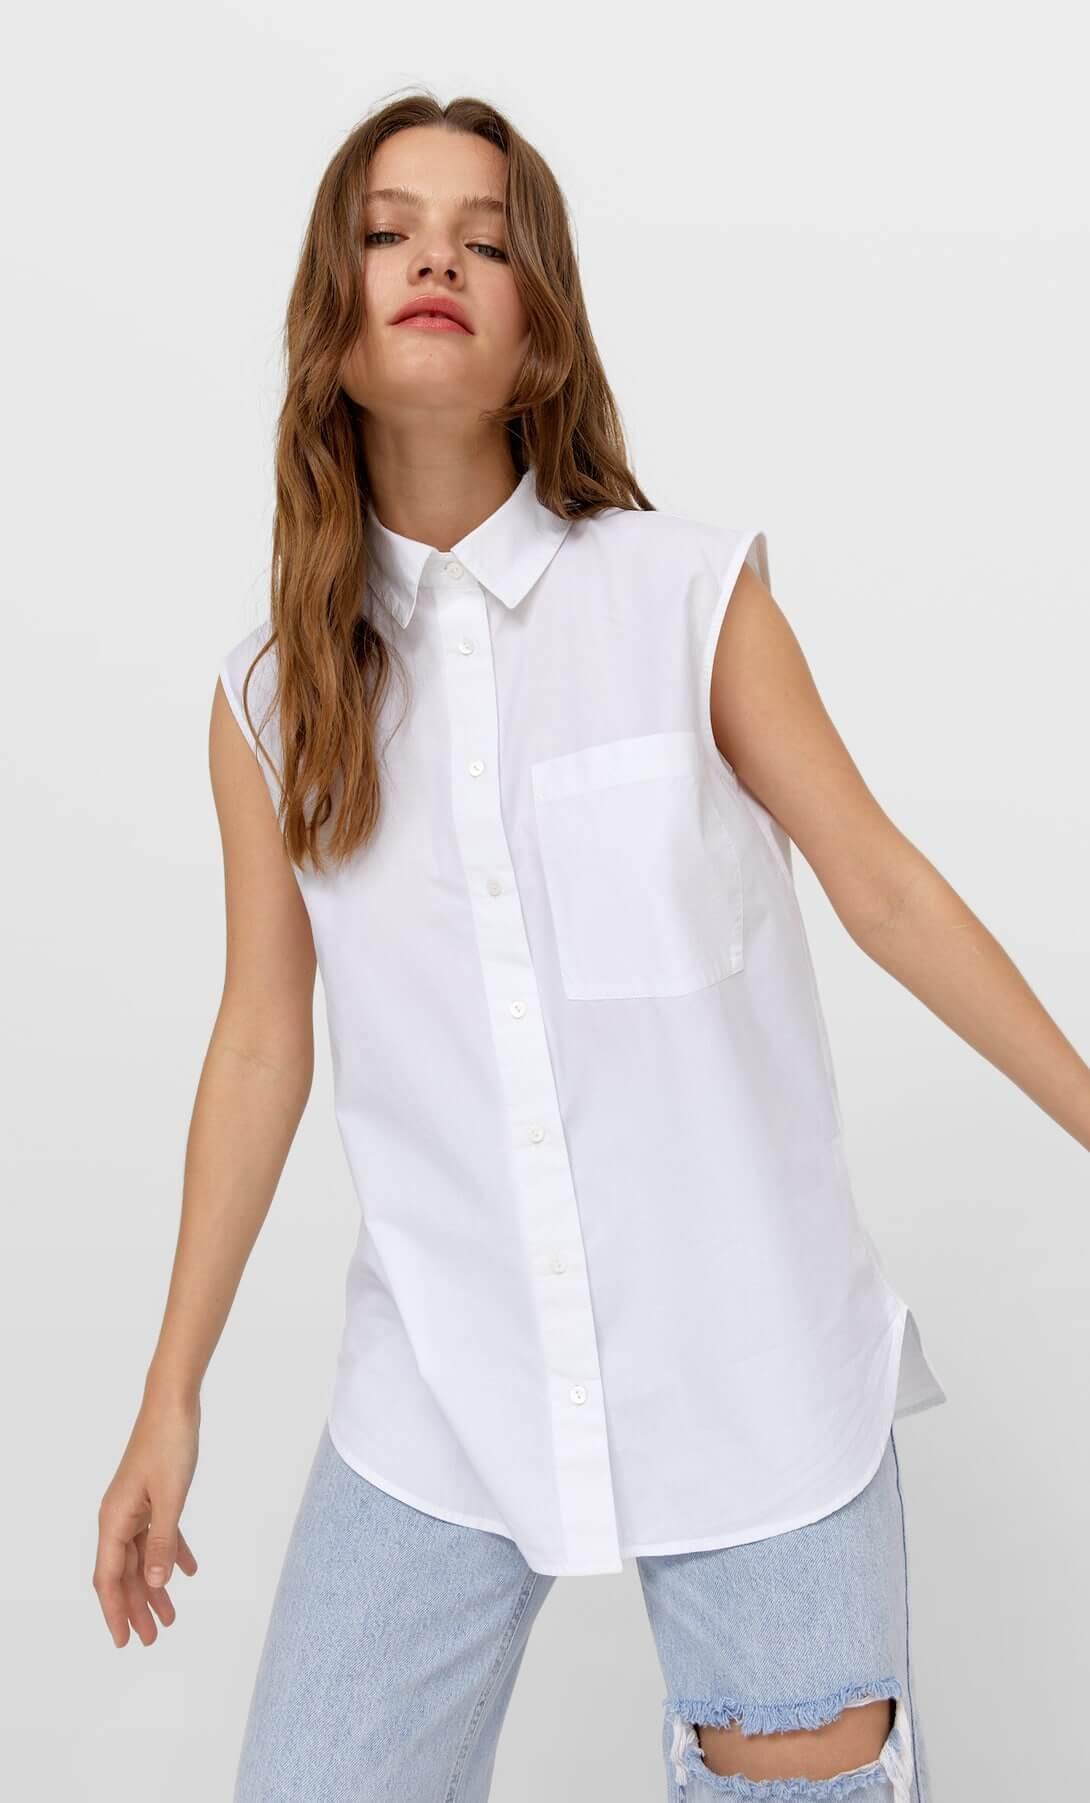 mulher vestida com camisa sem mangas da Stradivarius